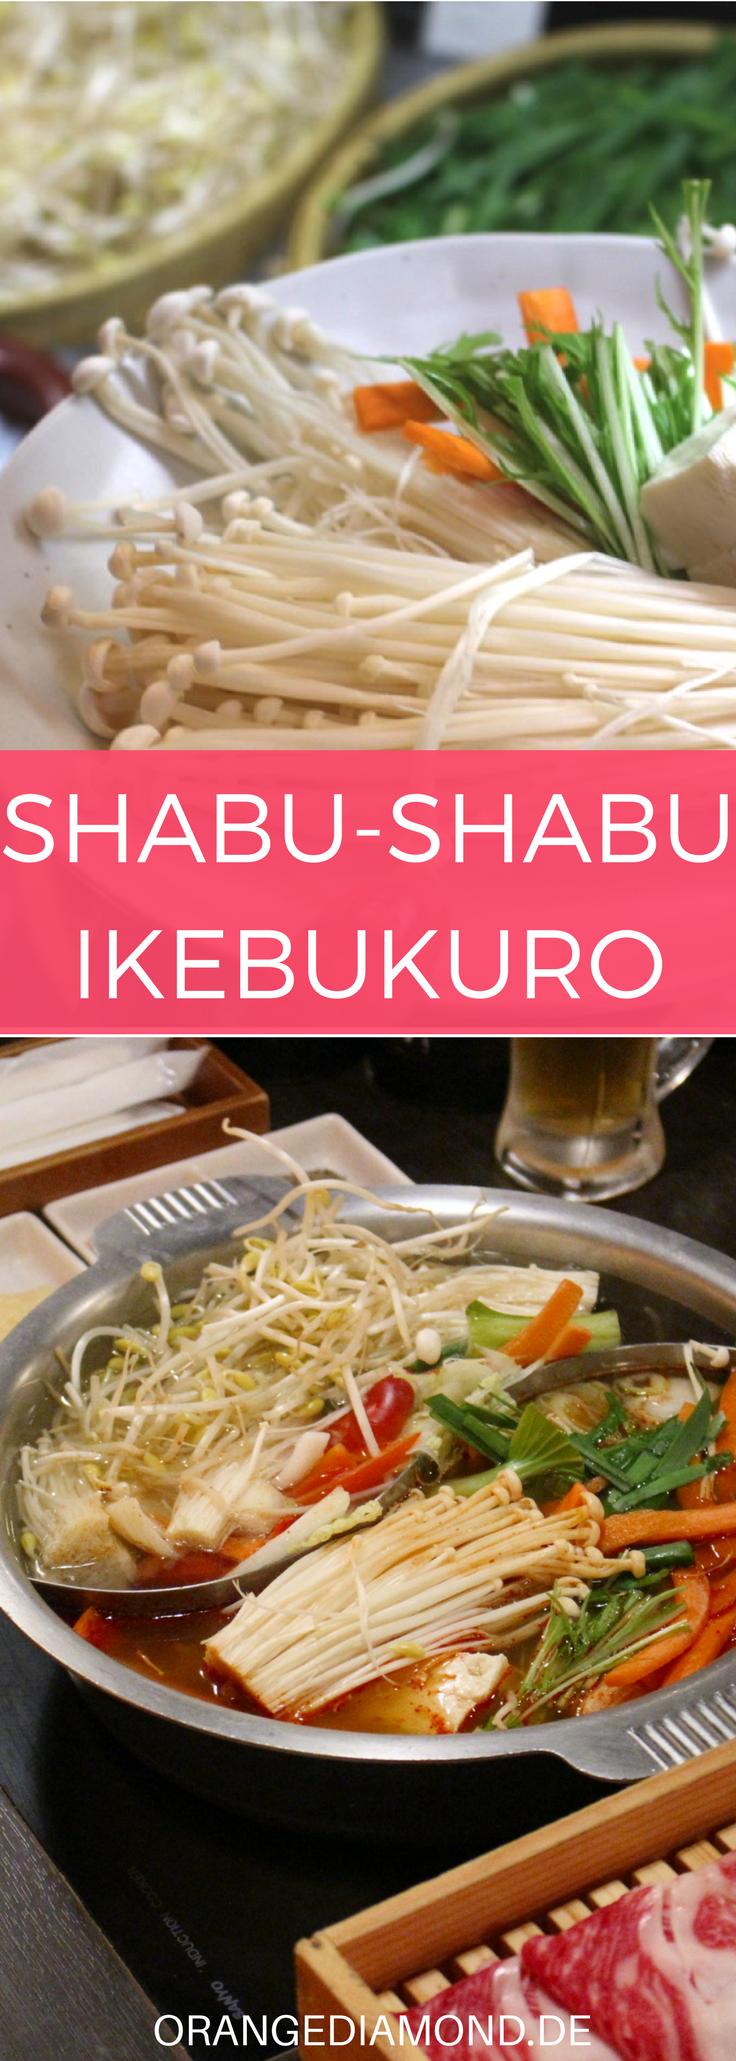 You Are Looking For A Good Shabu Shabu Restaurant In Ikebukuro Shabu Shabu Is A Healthy Hot Pan Meal One Of The Dishe Culinary Travel Shabu Shabu Food Guide